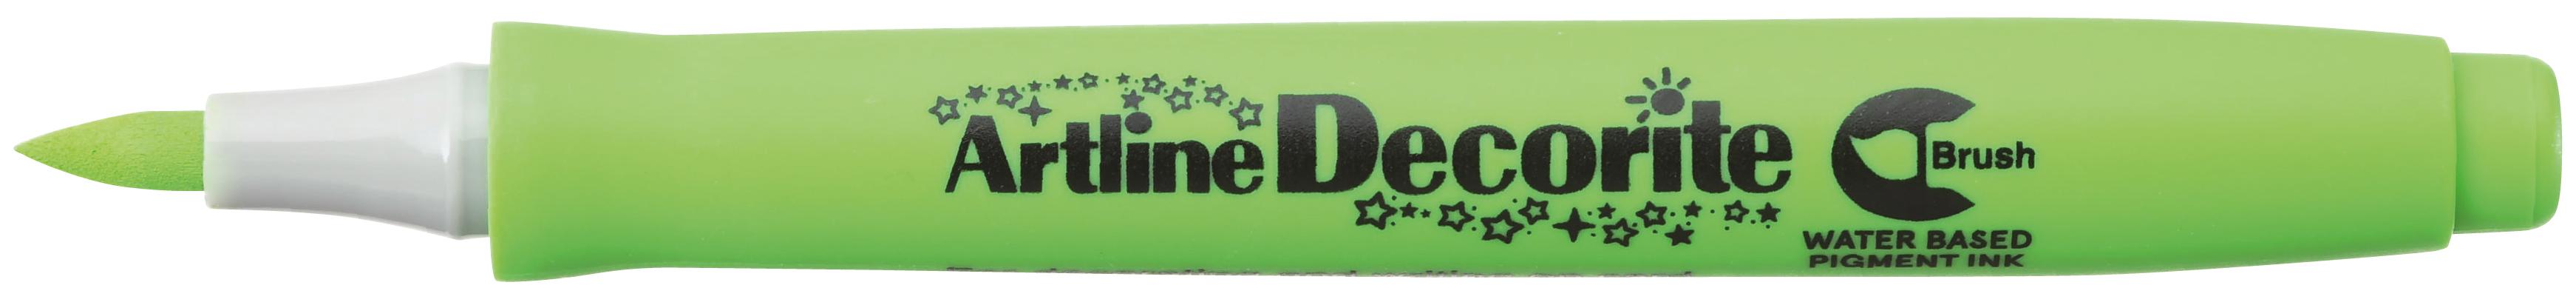 Artline Decorite Brush Gul Grønn